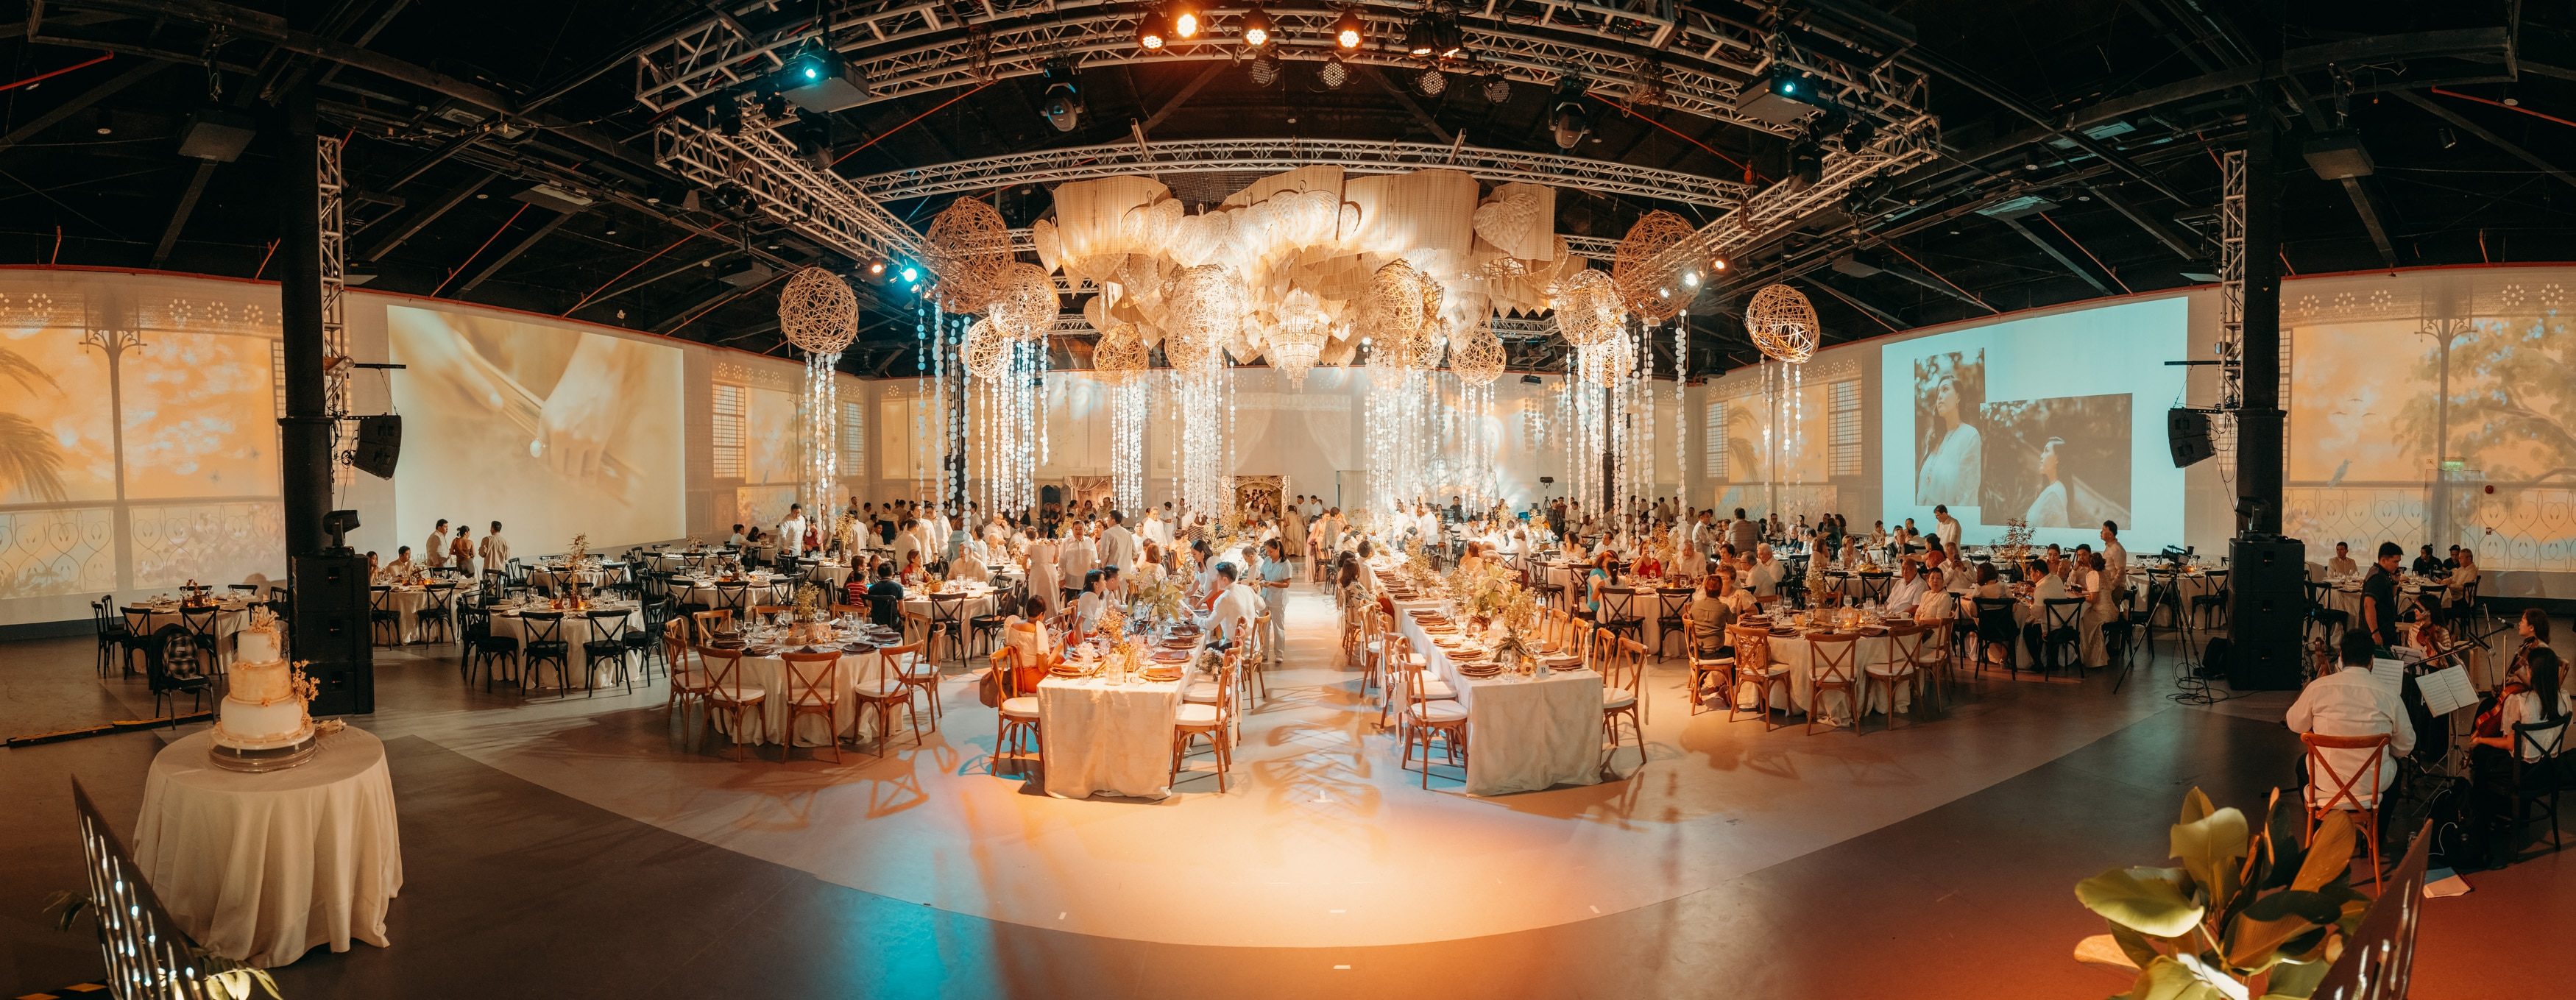 real weddings dominique gana and o jonathan pabill 0